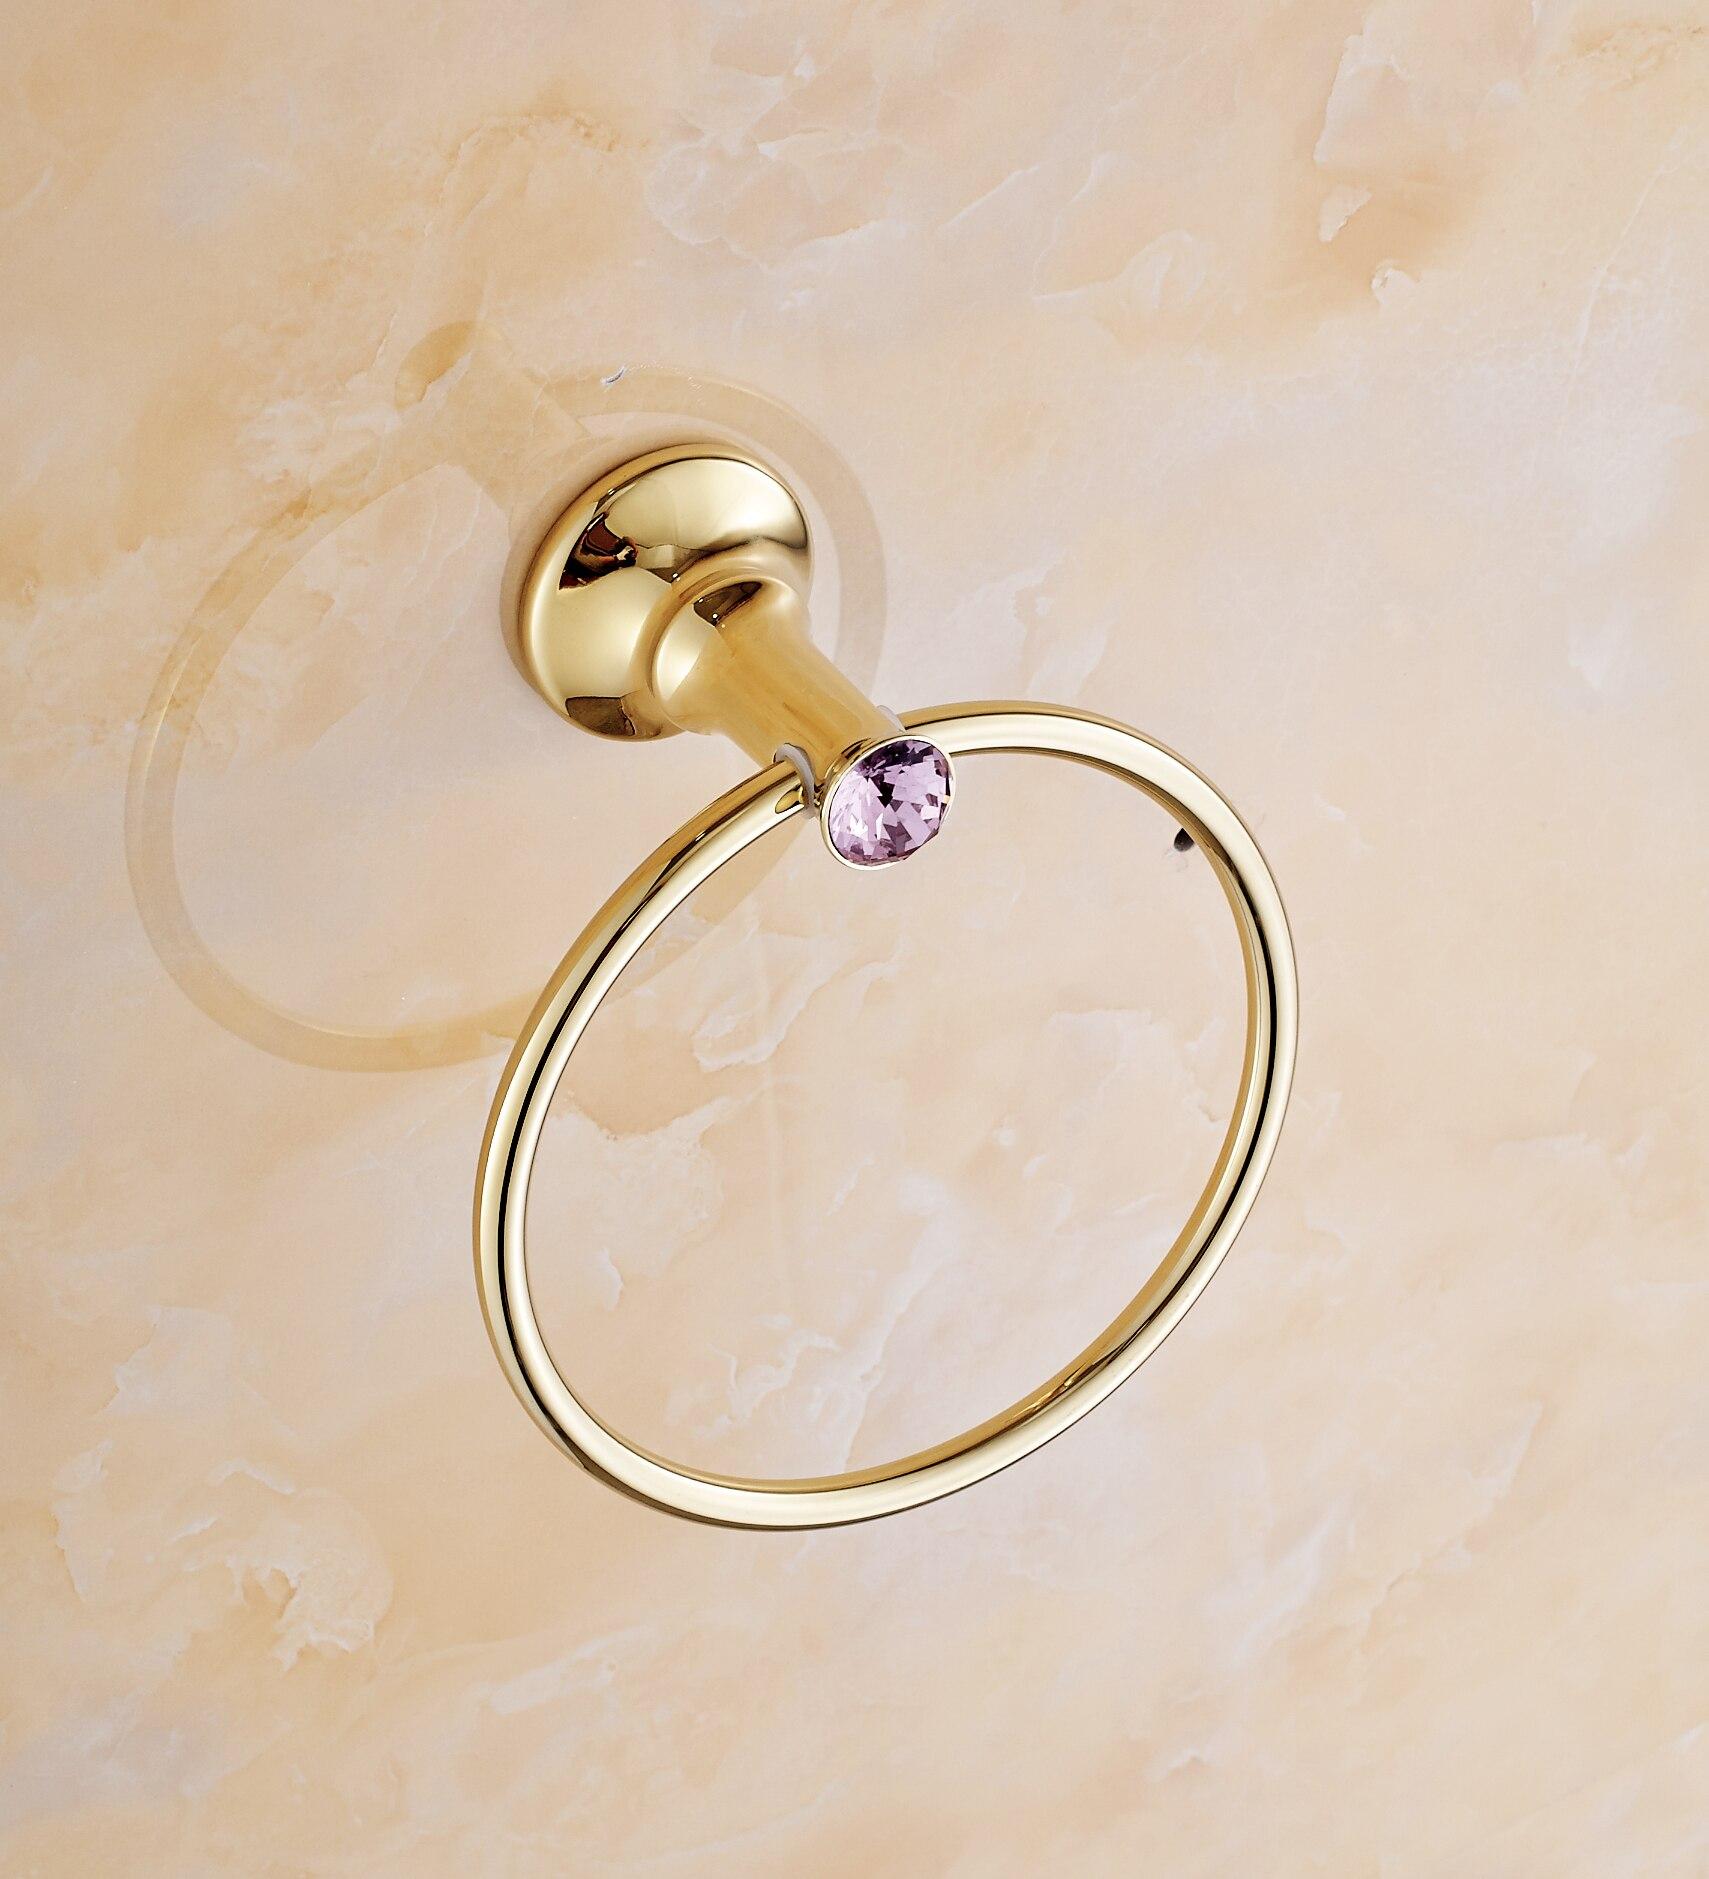 Copper Bathroom Accessories Sets Popular Purple Bathroom Accessories Sets Buy Cheap Purple Bathroom